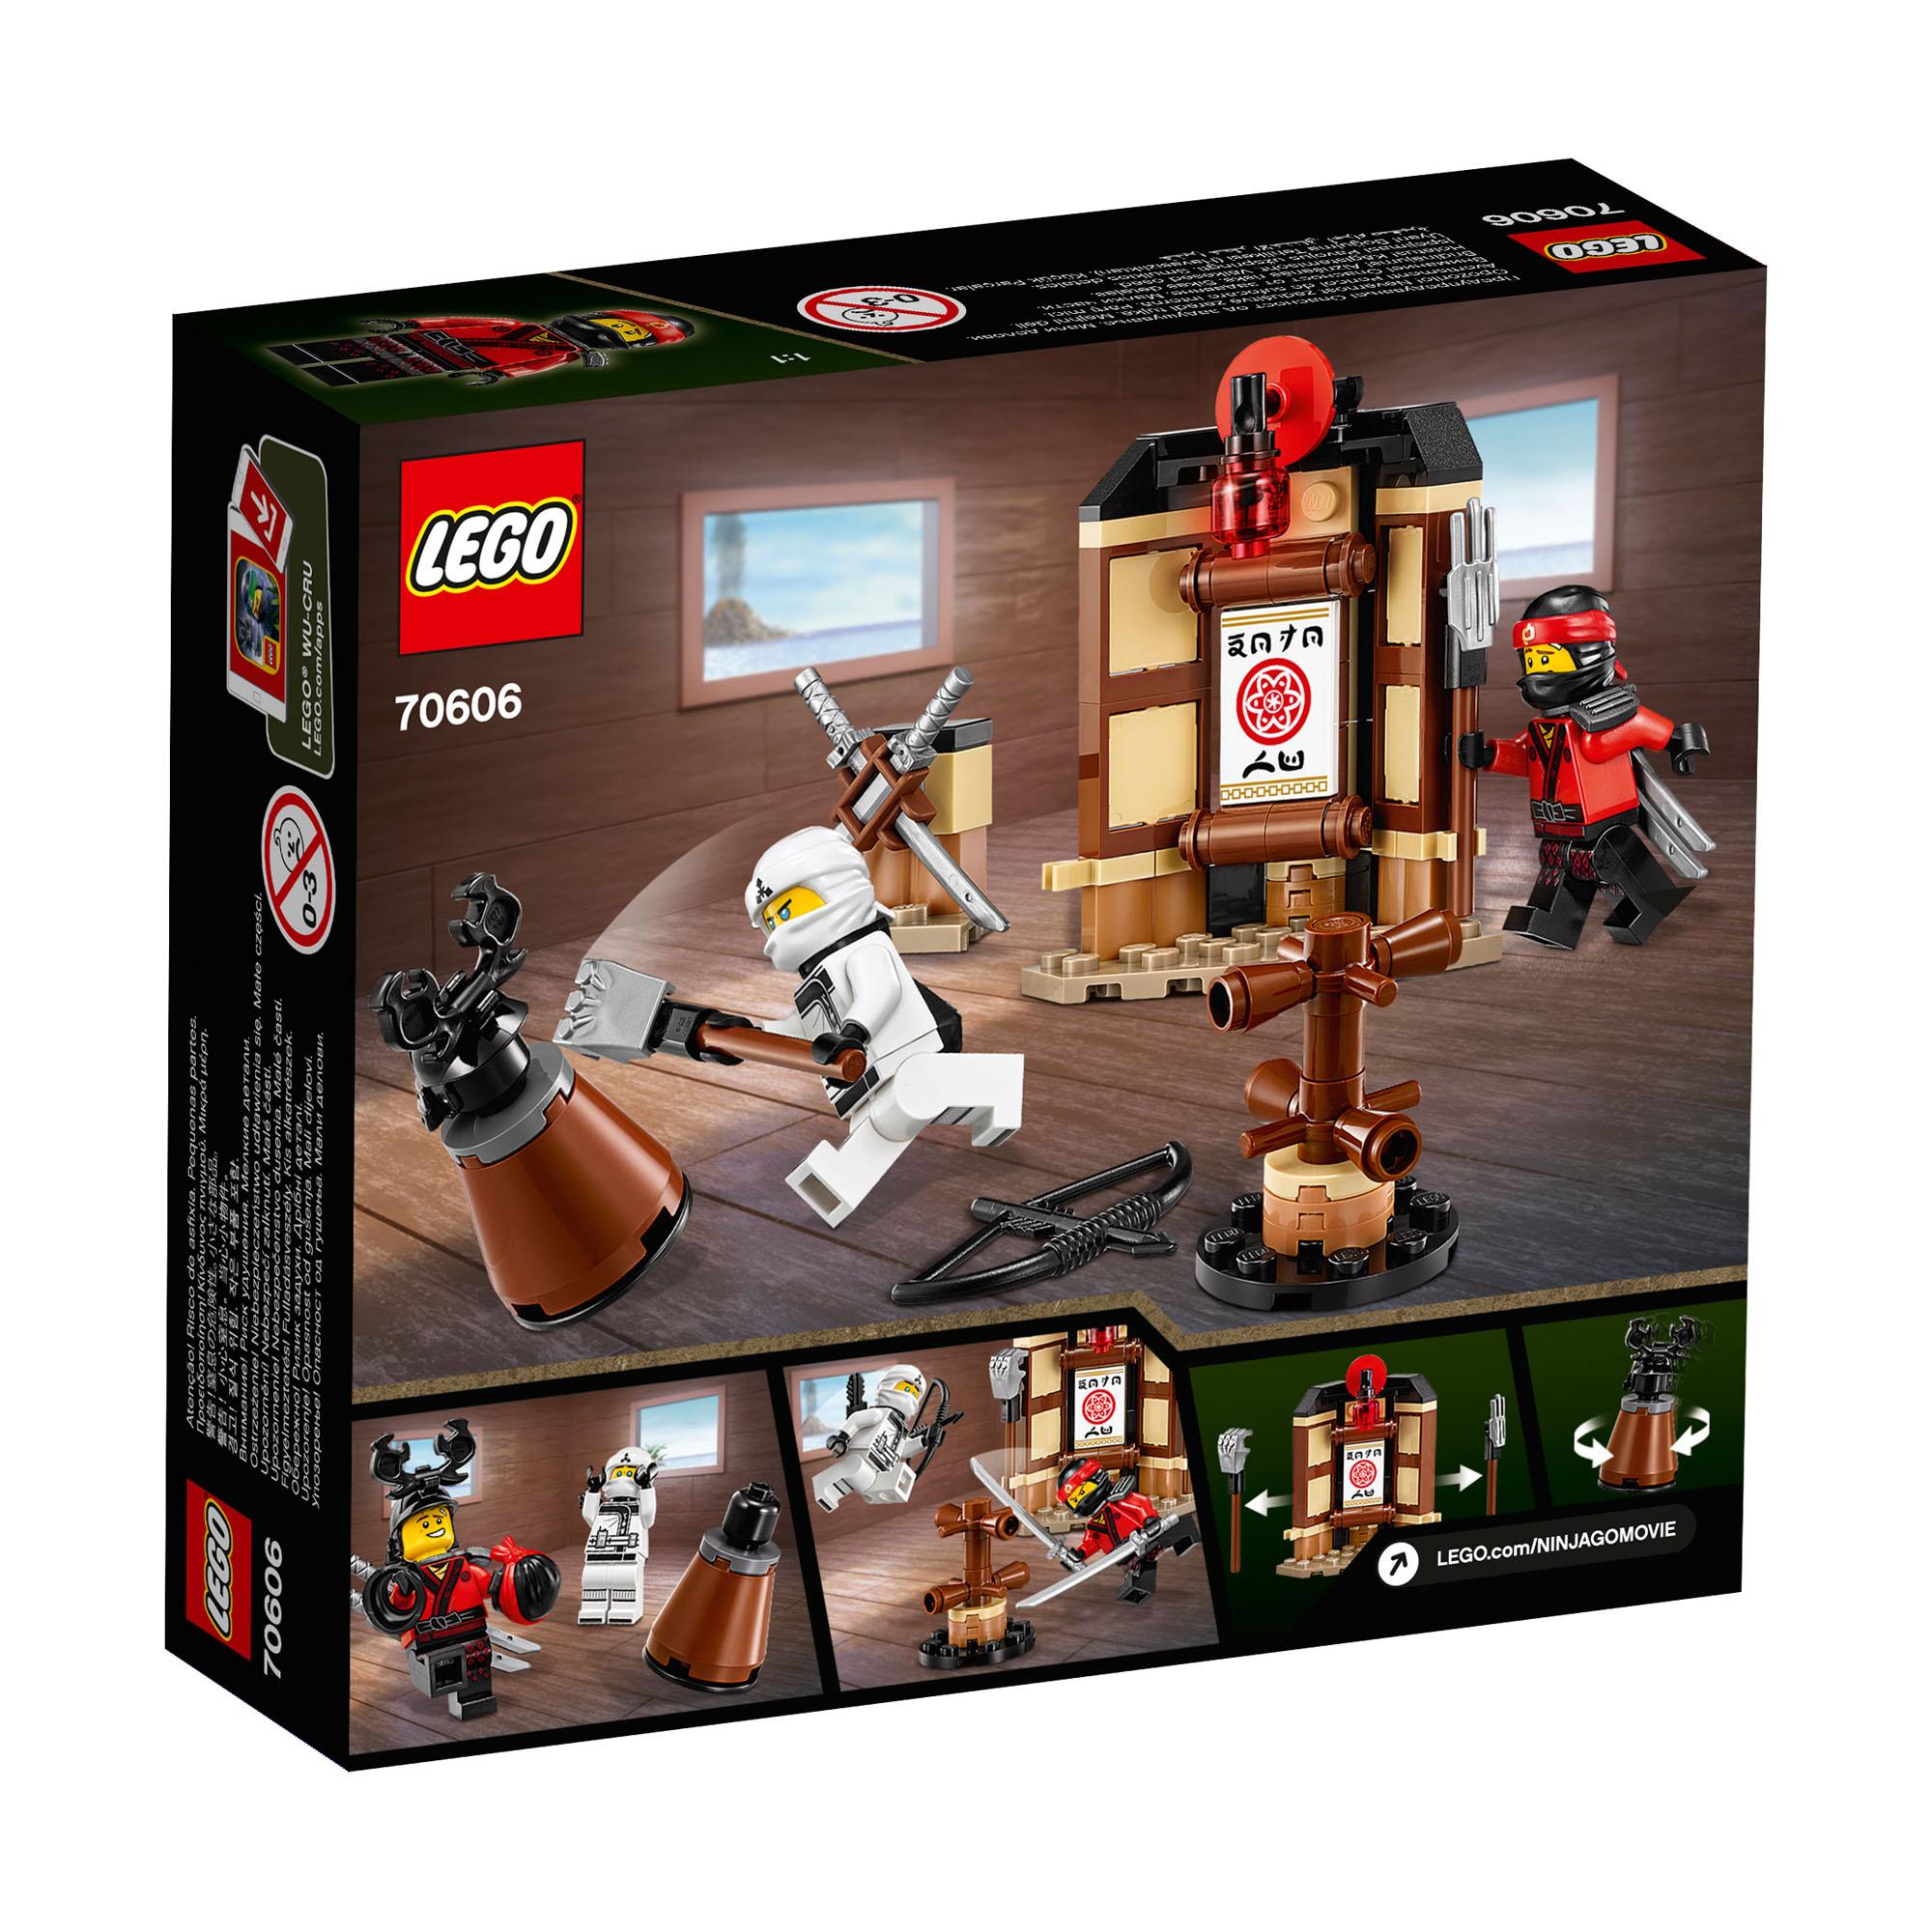 70606 lego ninjago movie spinjitzu training 109 pieces age 6 14 new release 2017 - Lego ninjago 6 ...